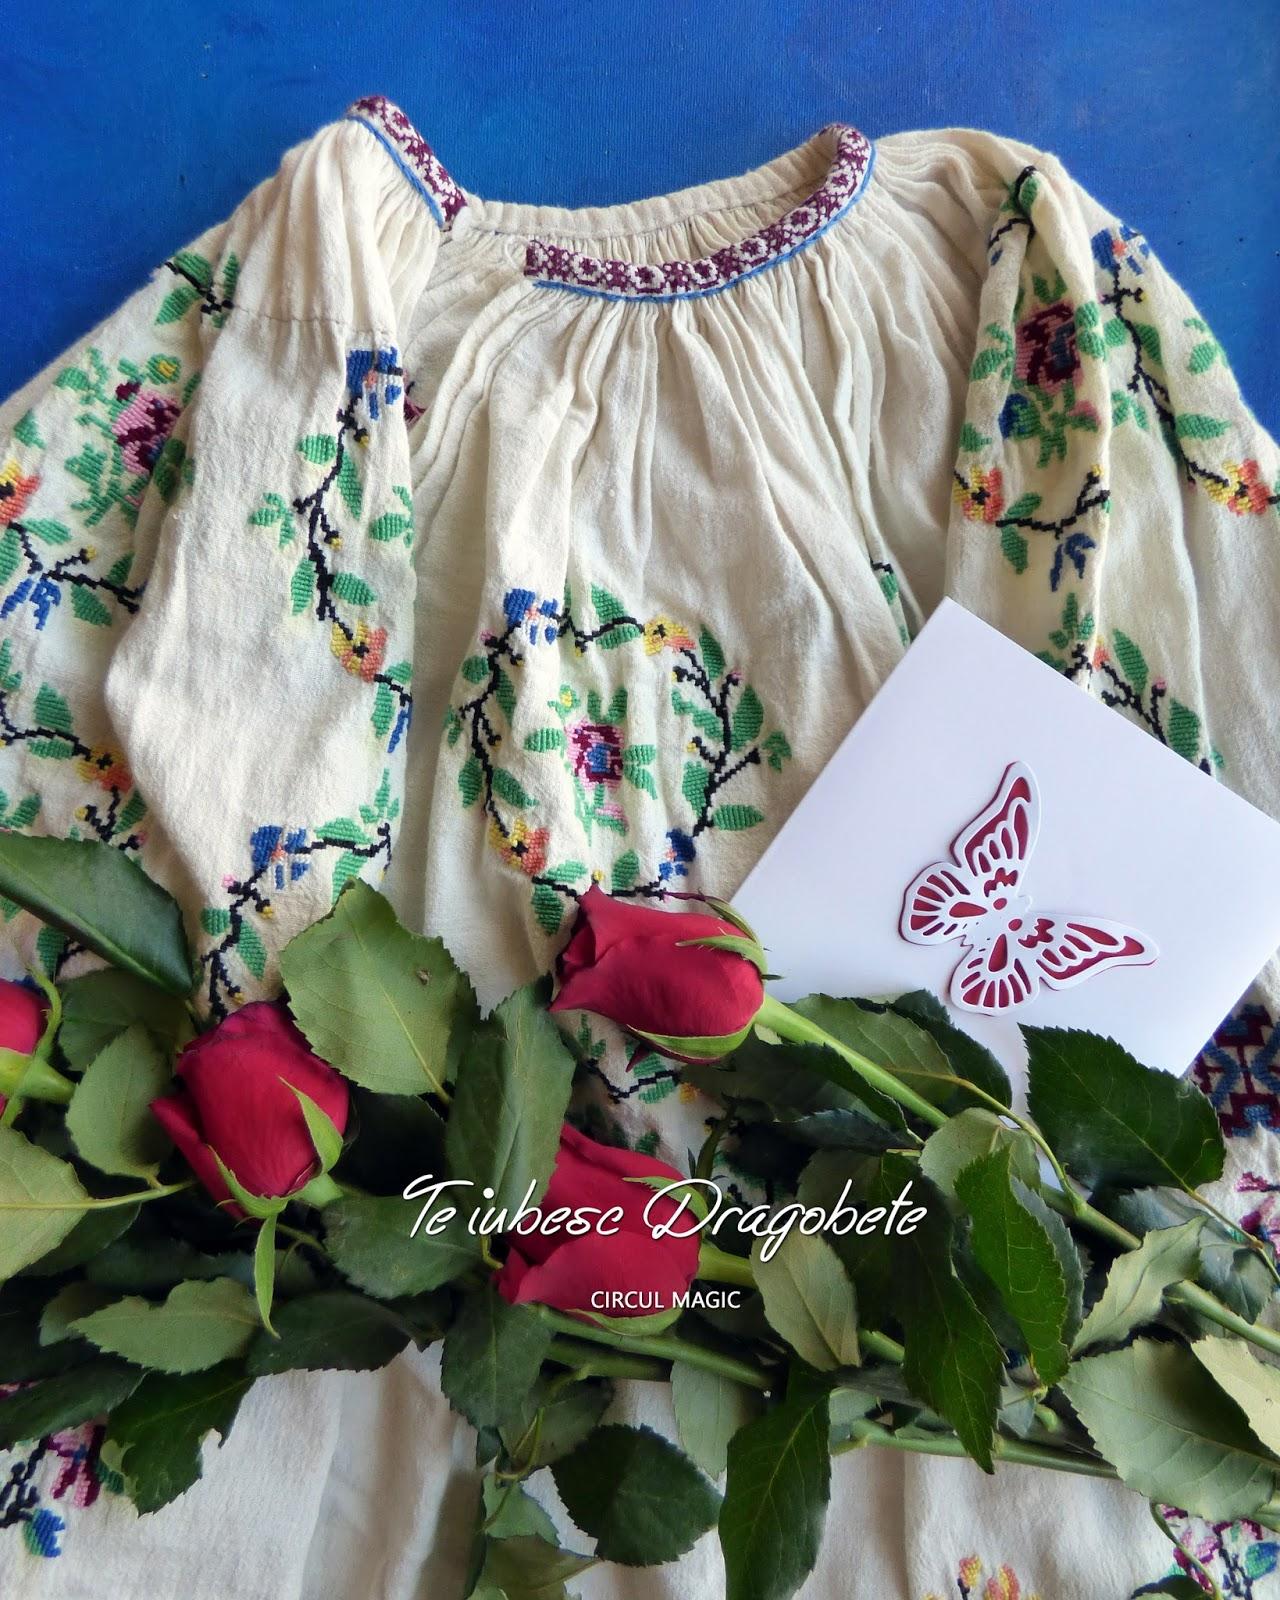 Te iubesc Dragobete Ie Broderie Trandafiri Felicitare Fluture Handmade